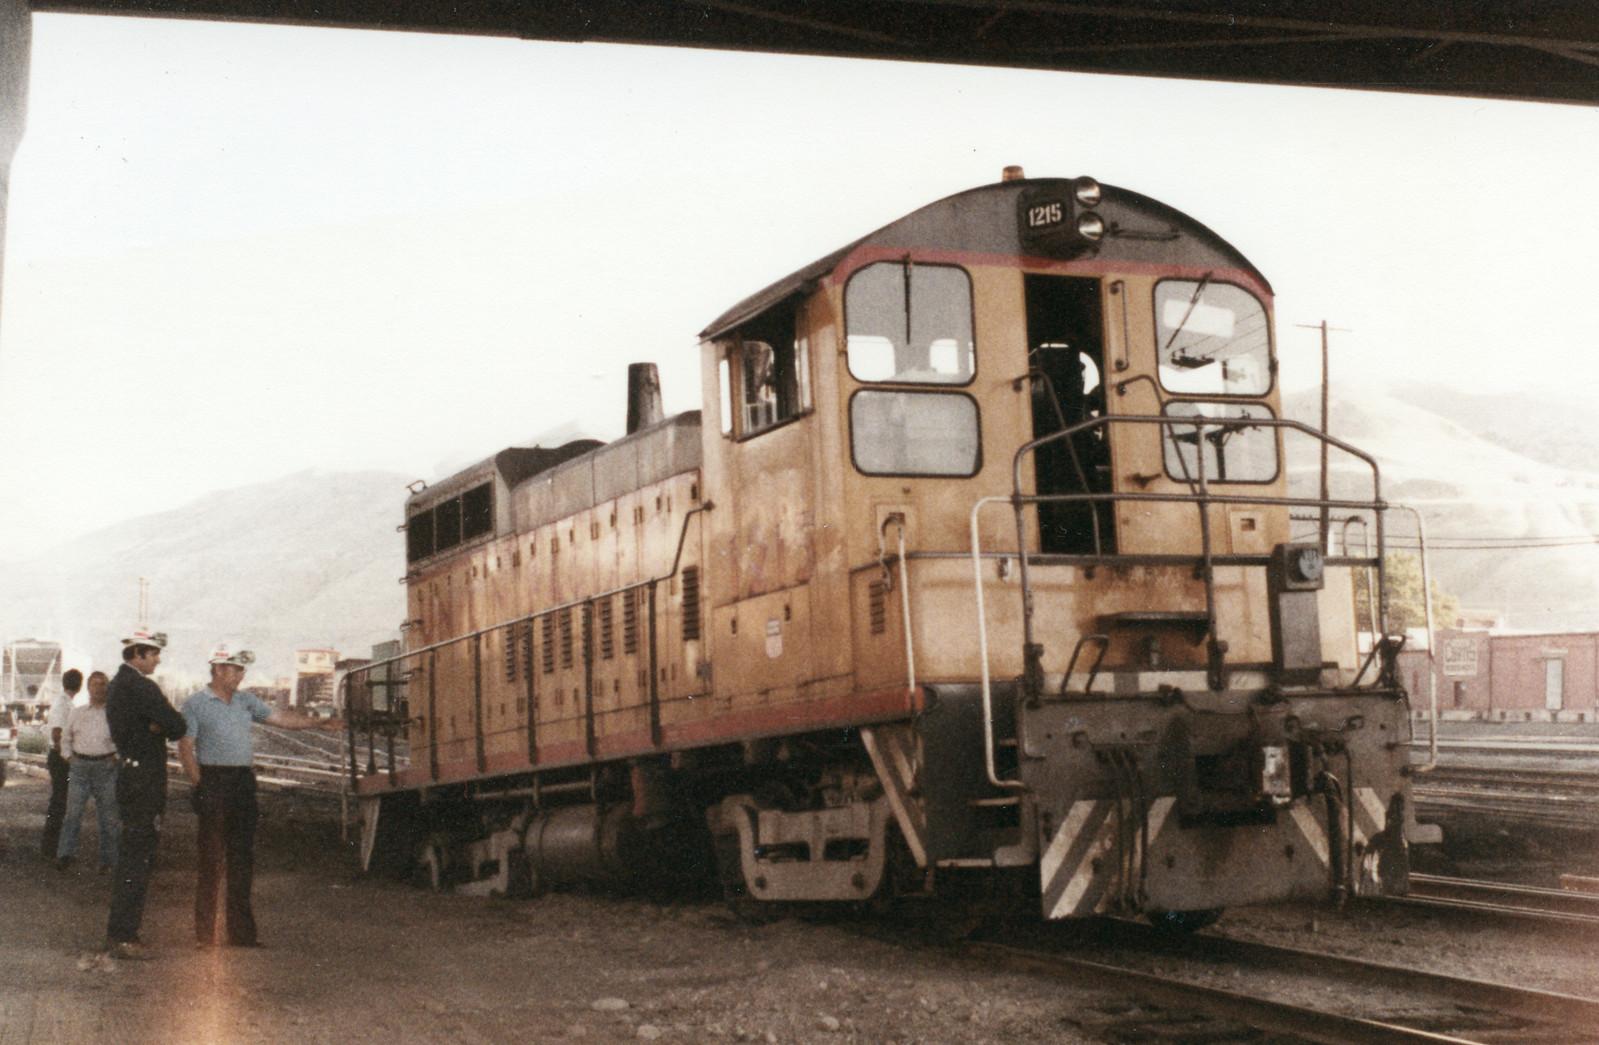 UP_SW-10_1215-derailed-North-Temple_b_Salt-Lake-City_Dave-England-photo